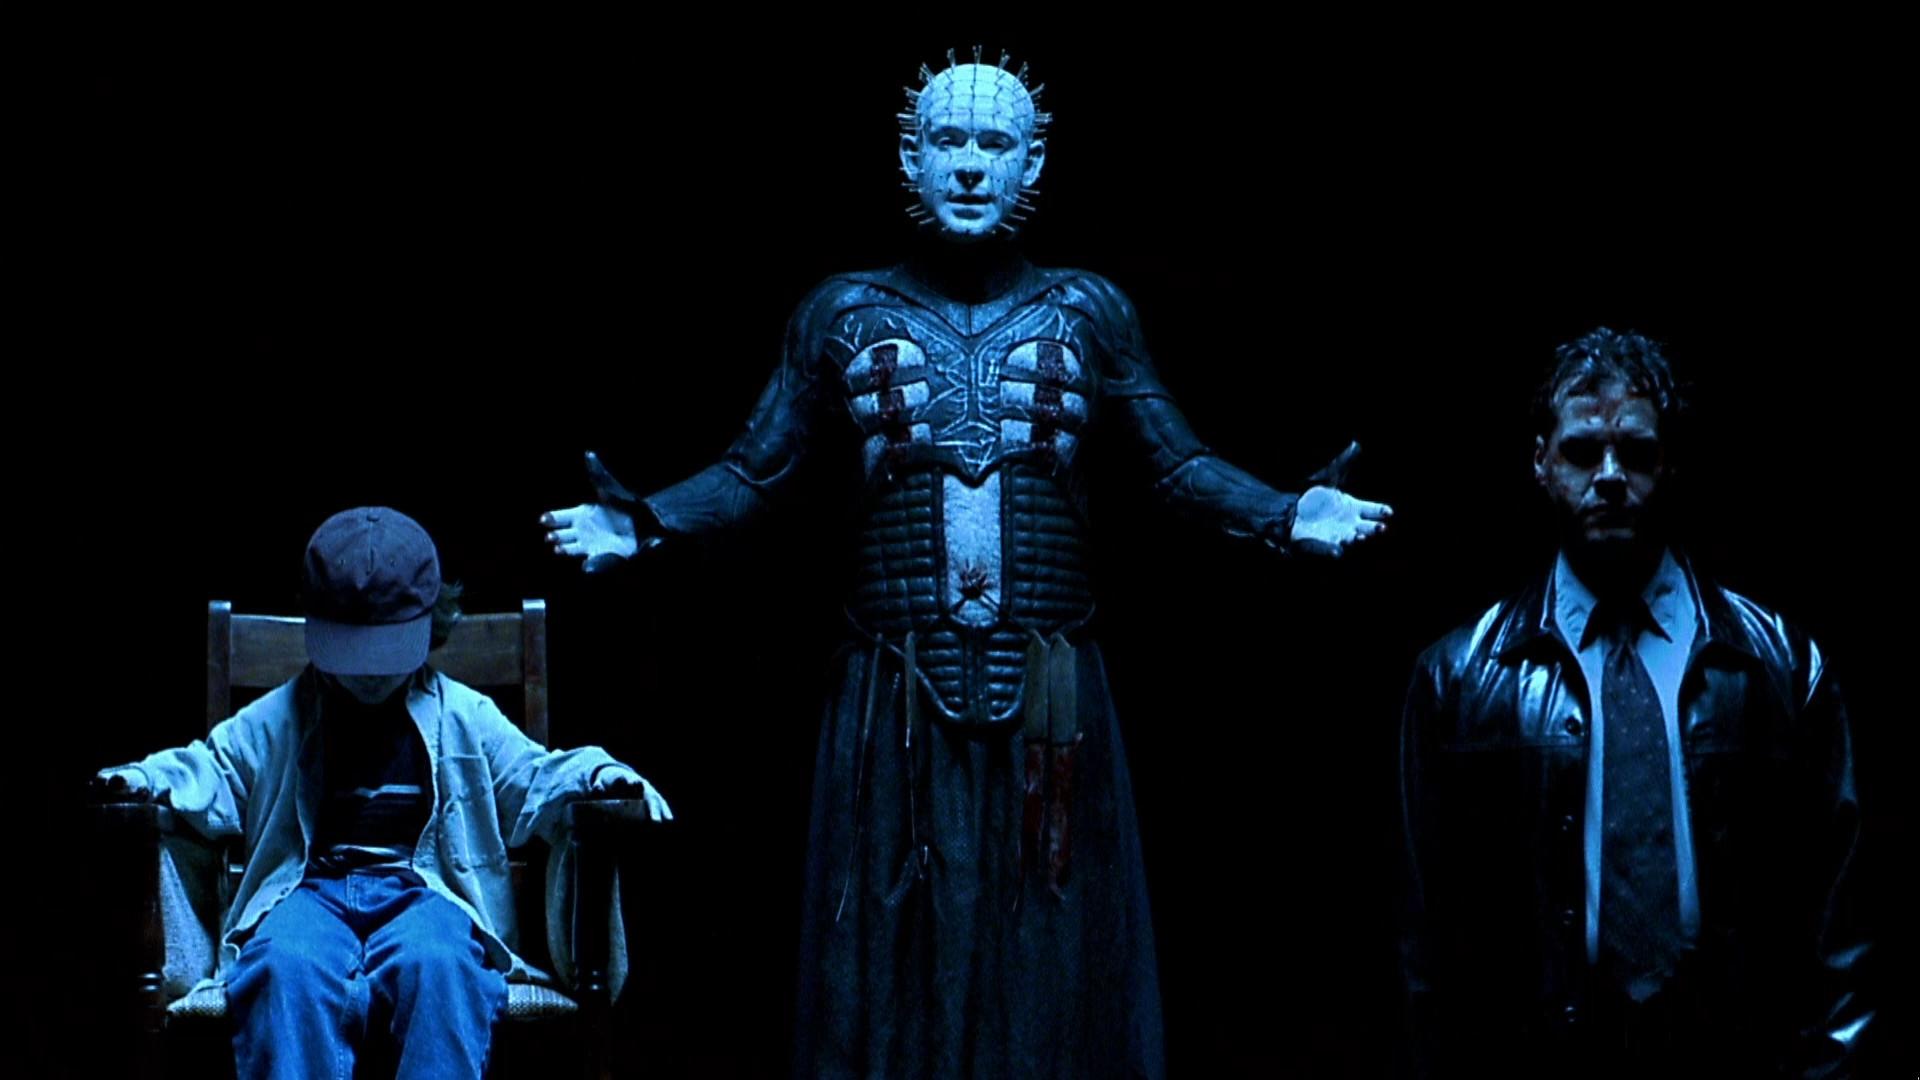 Pinhead (Doug Bradley) (c) with J.B Gaynor (l) and Craig Sheffer (r) held prisoner in Hellraiser: Inferno (2000)